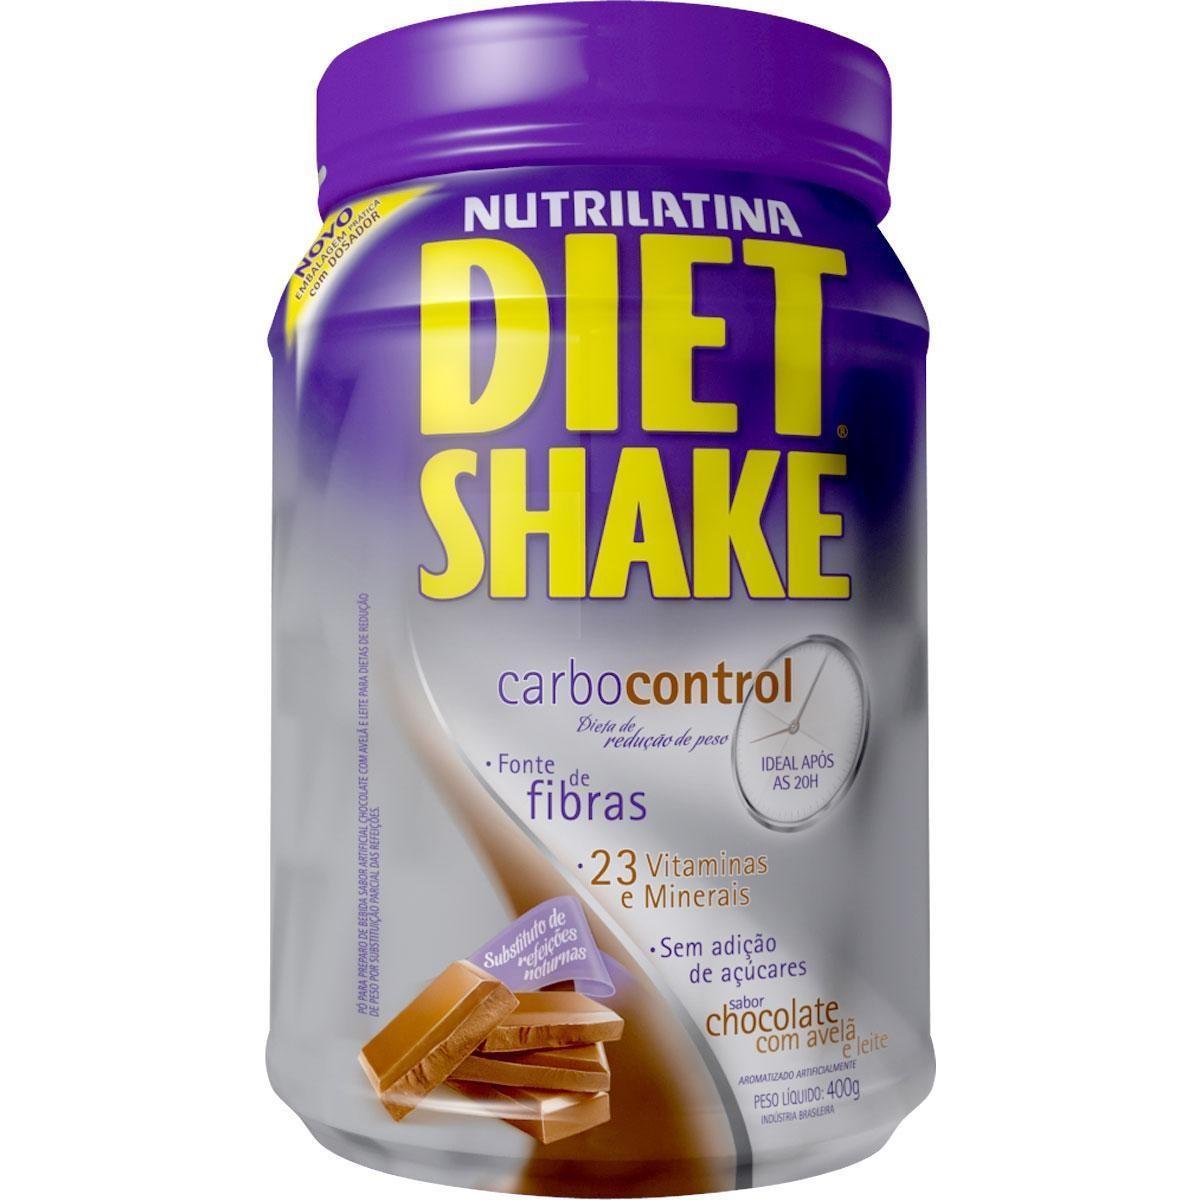 Diet Shake Carbo Control (400g) Nutrilatina